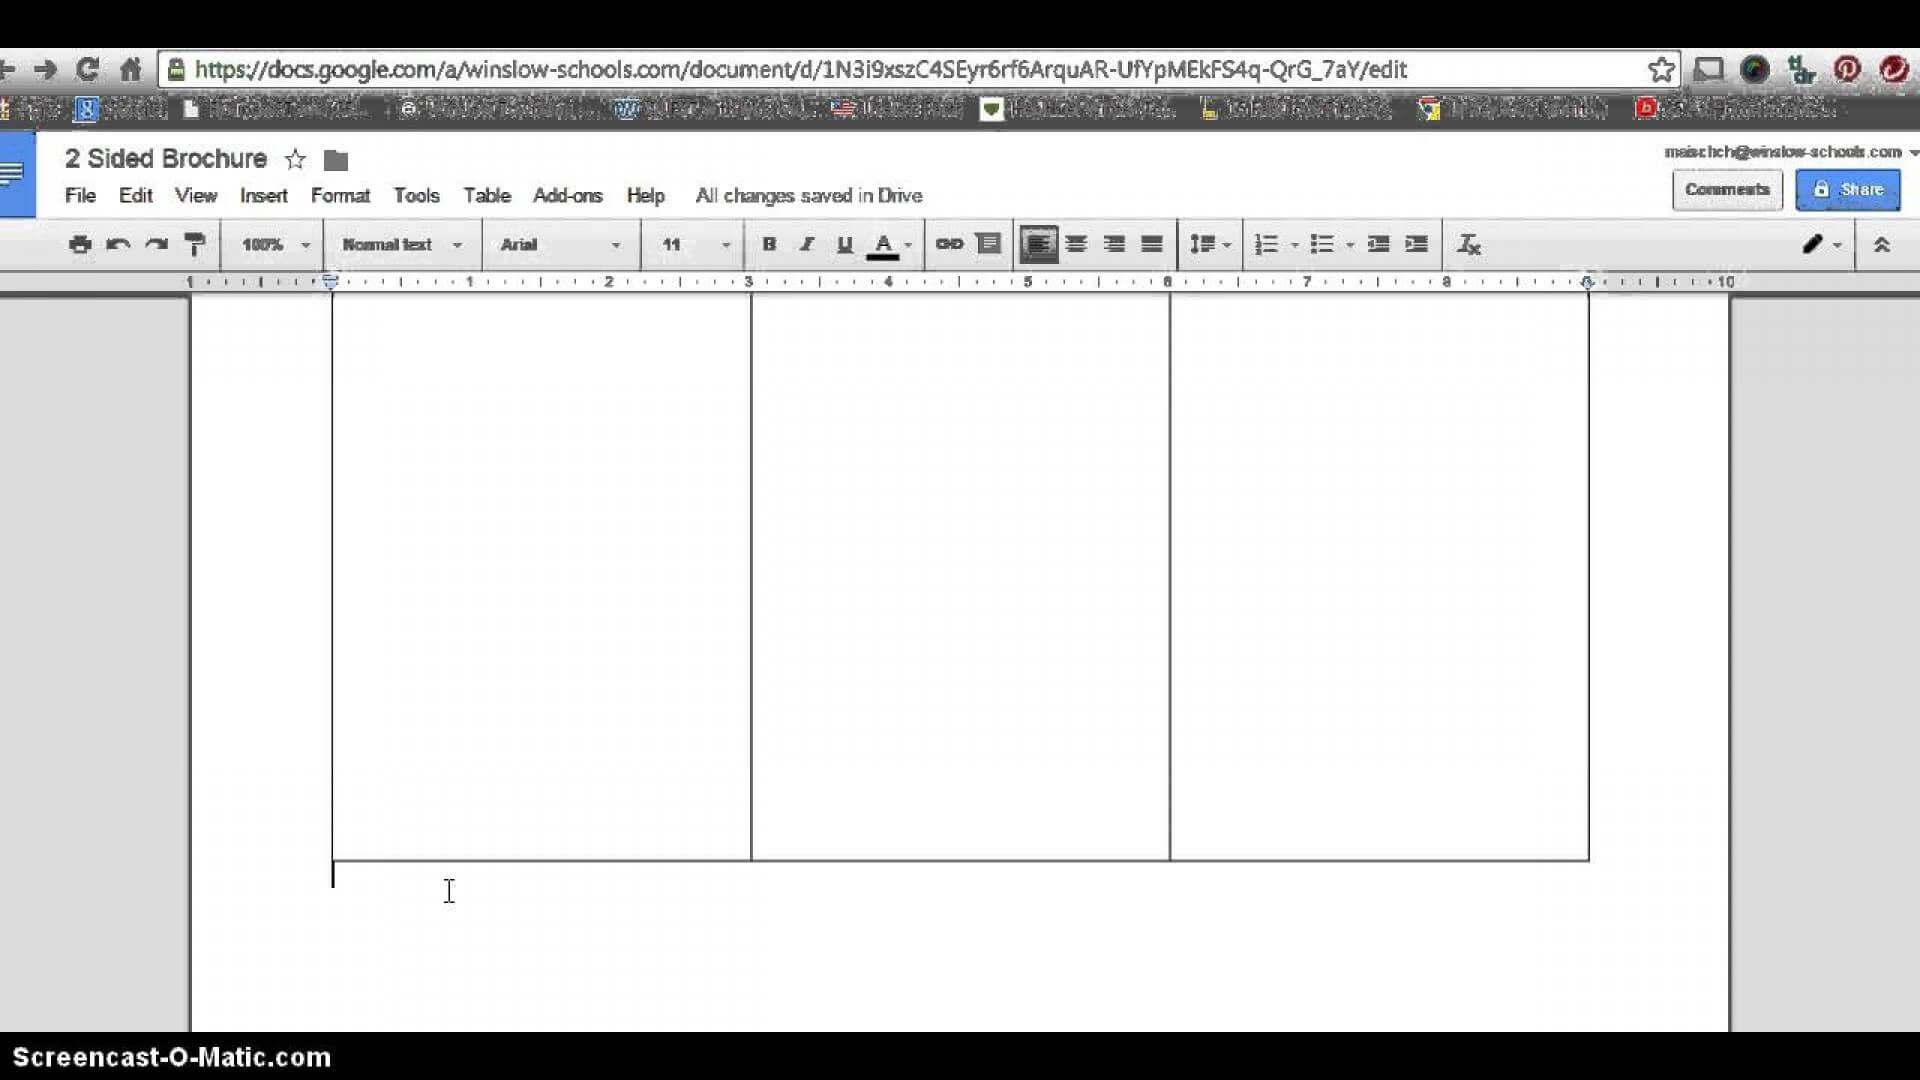 012 Blank Tri Fold Brochure Template Google Docs Slides Top Regarding 6 Sided Brochure Template